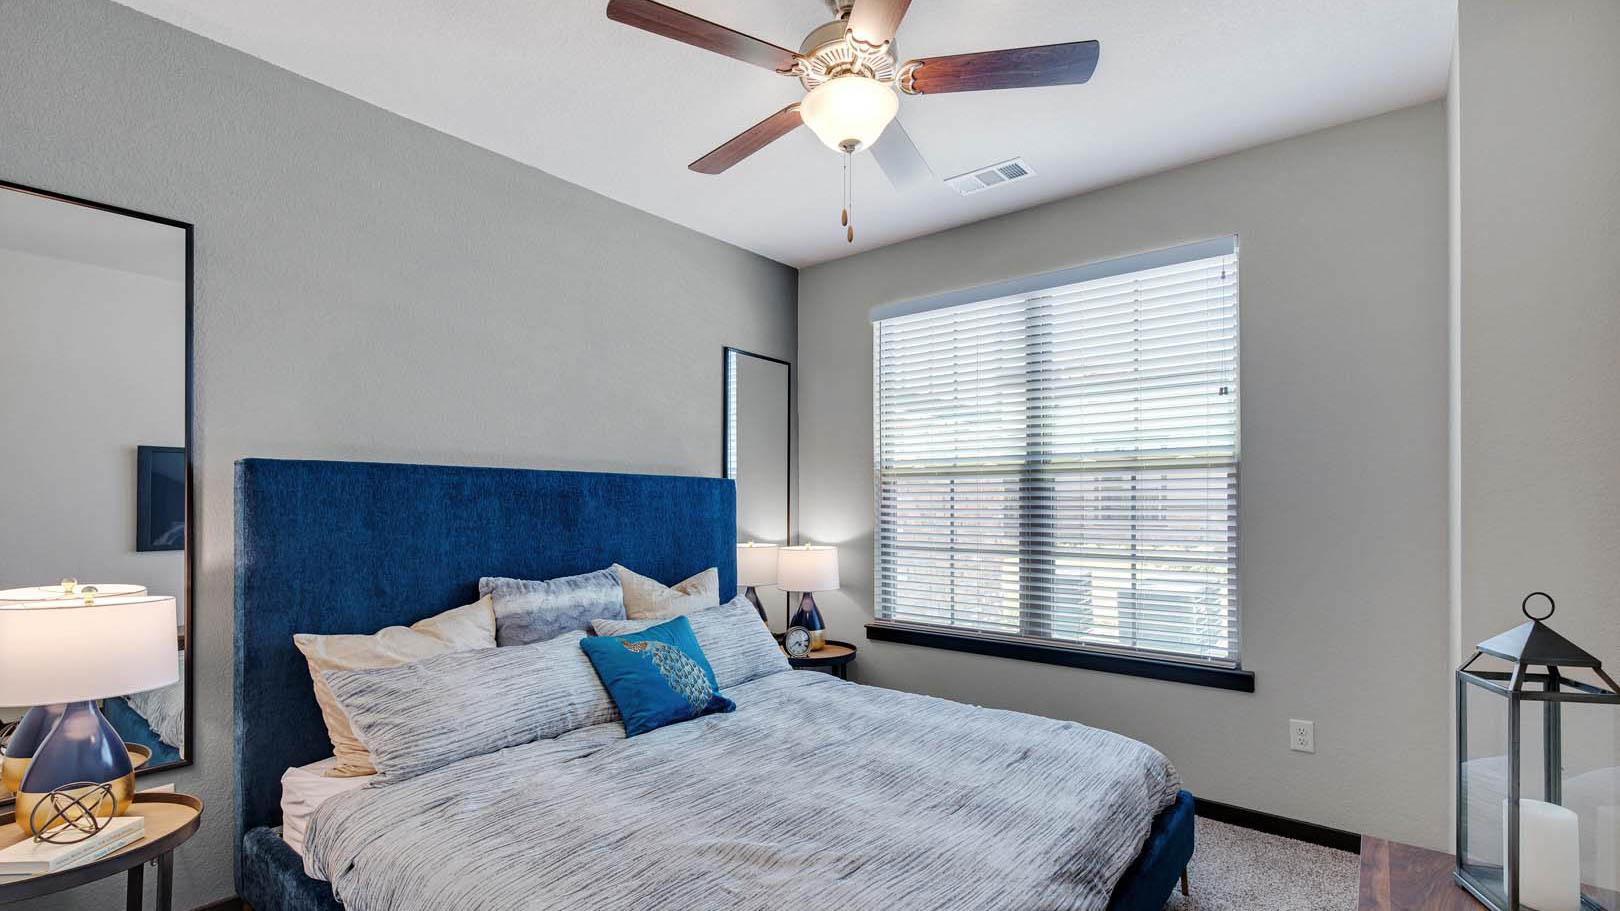 Bedroom in Rosenberg, TX